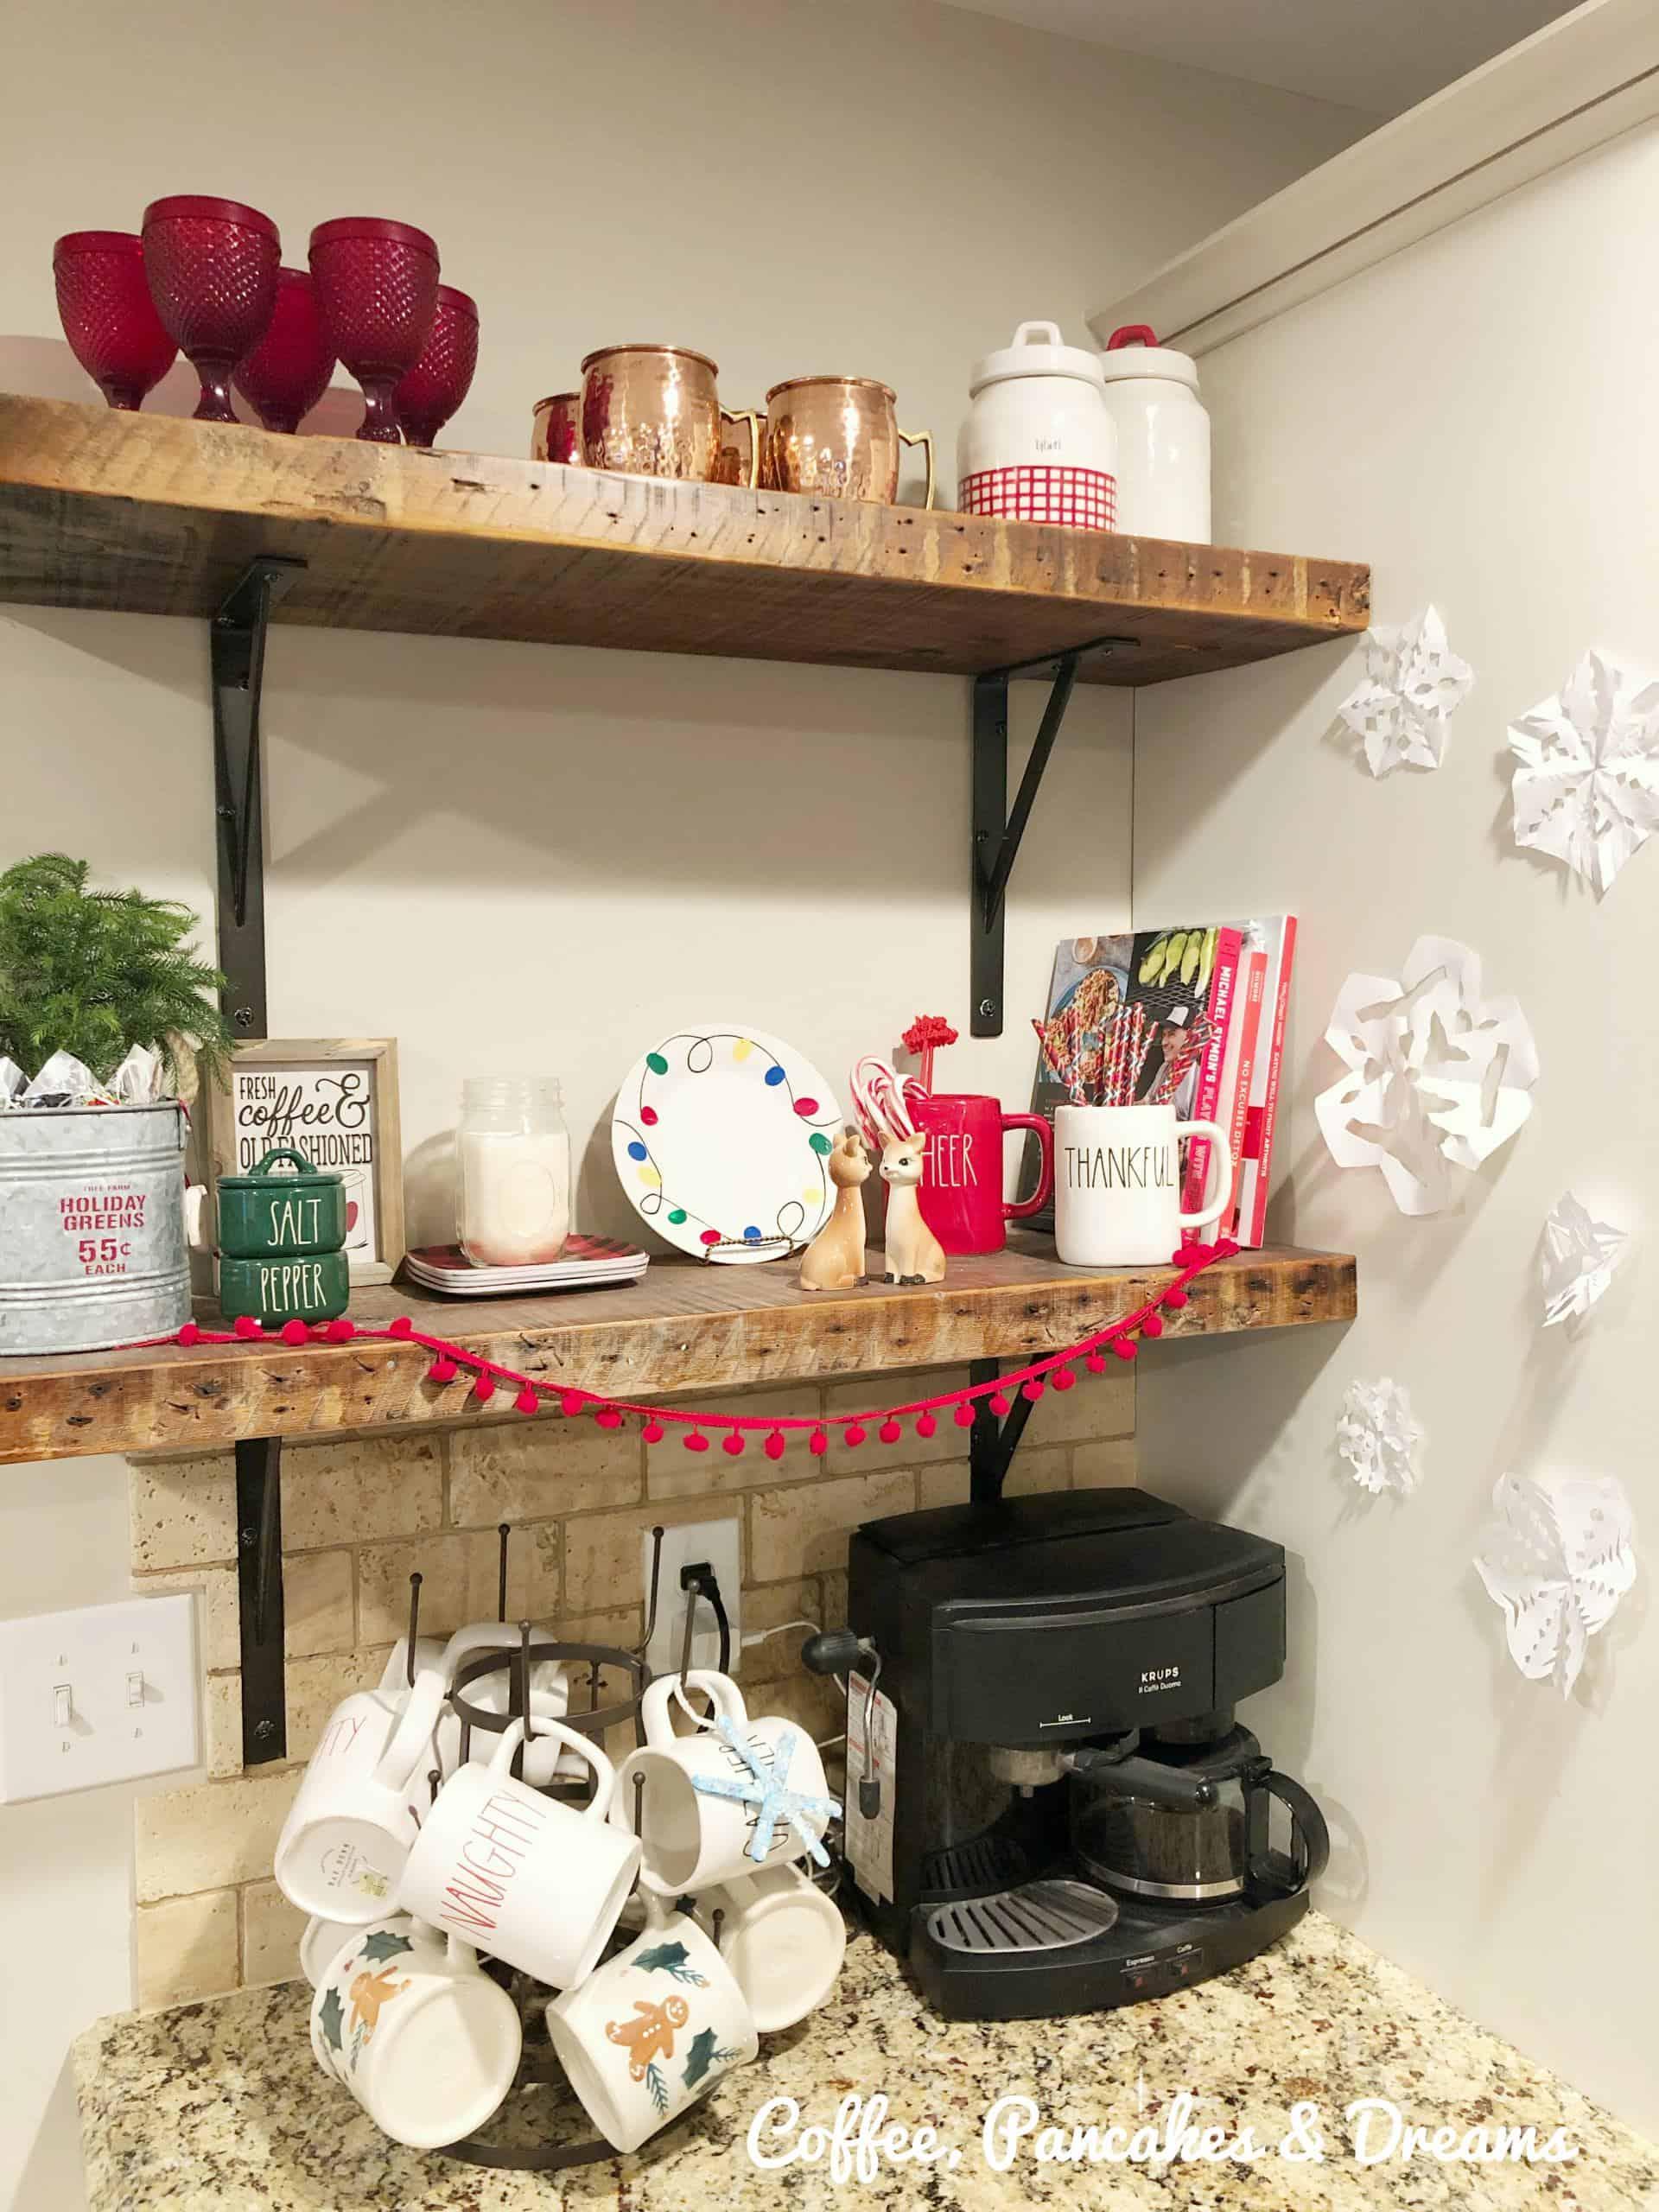 Cozy Cottage Style Christmas Decor Home Tour Coffee Pancakes Dreams